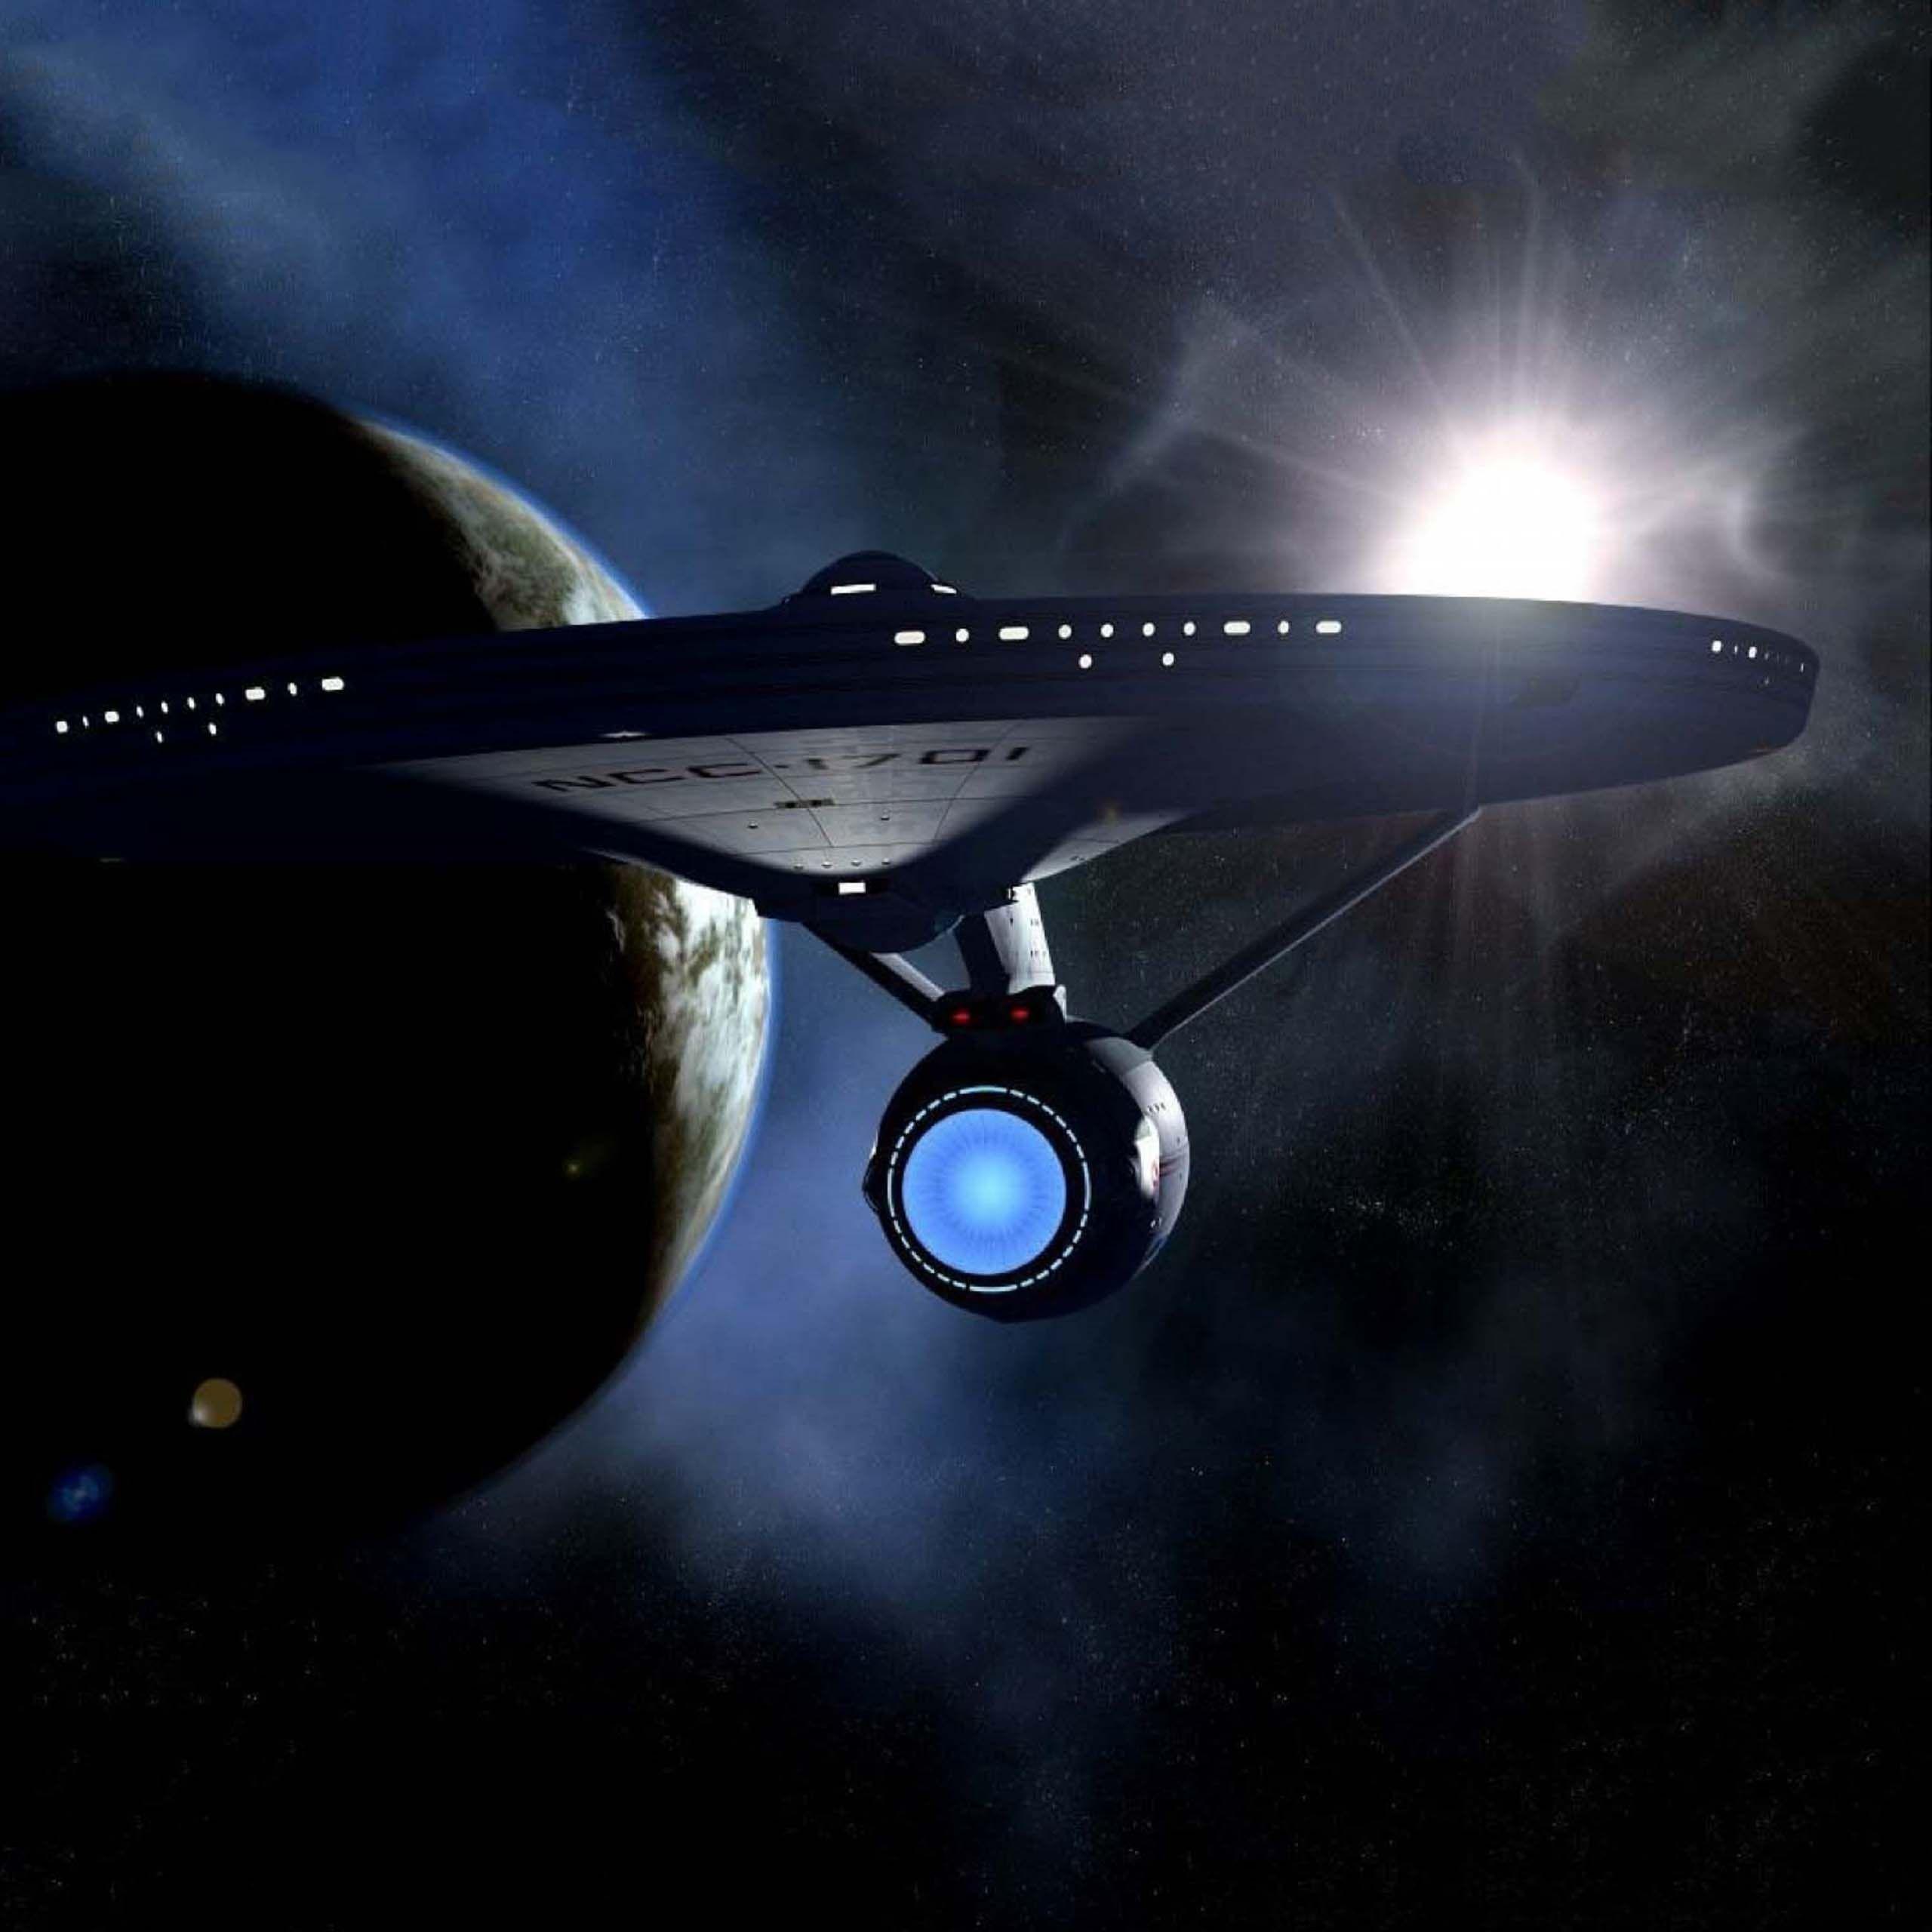 Star Trek Wallpapers Ipad Wallpaper Cave